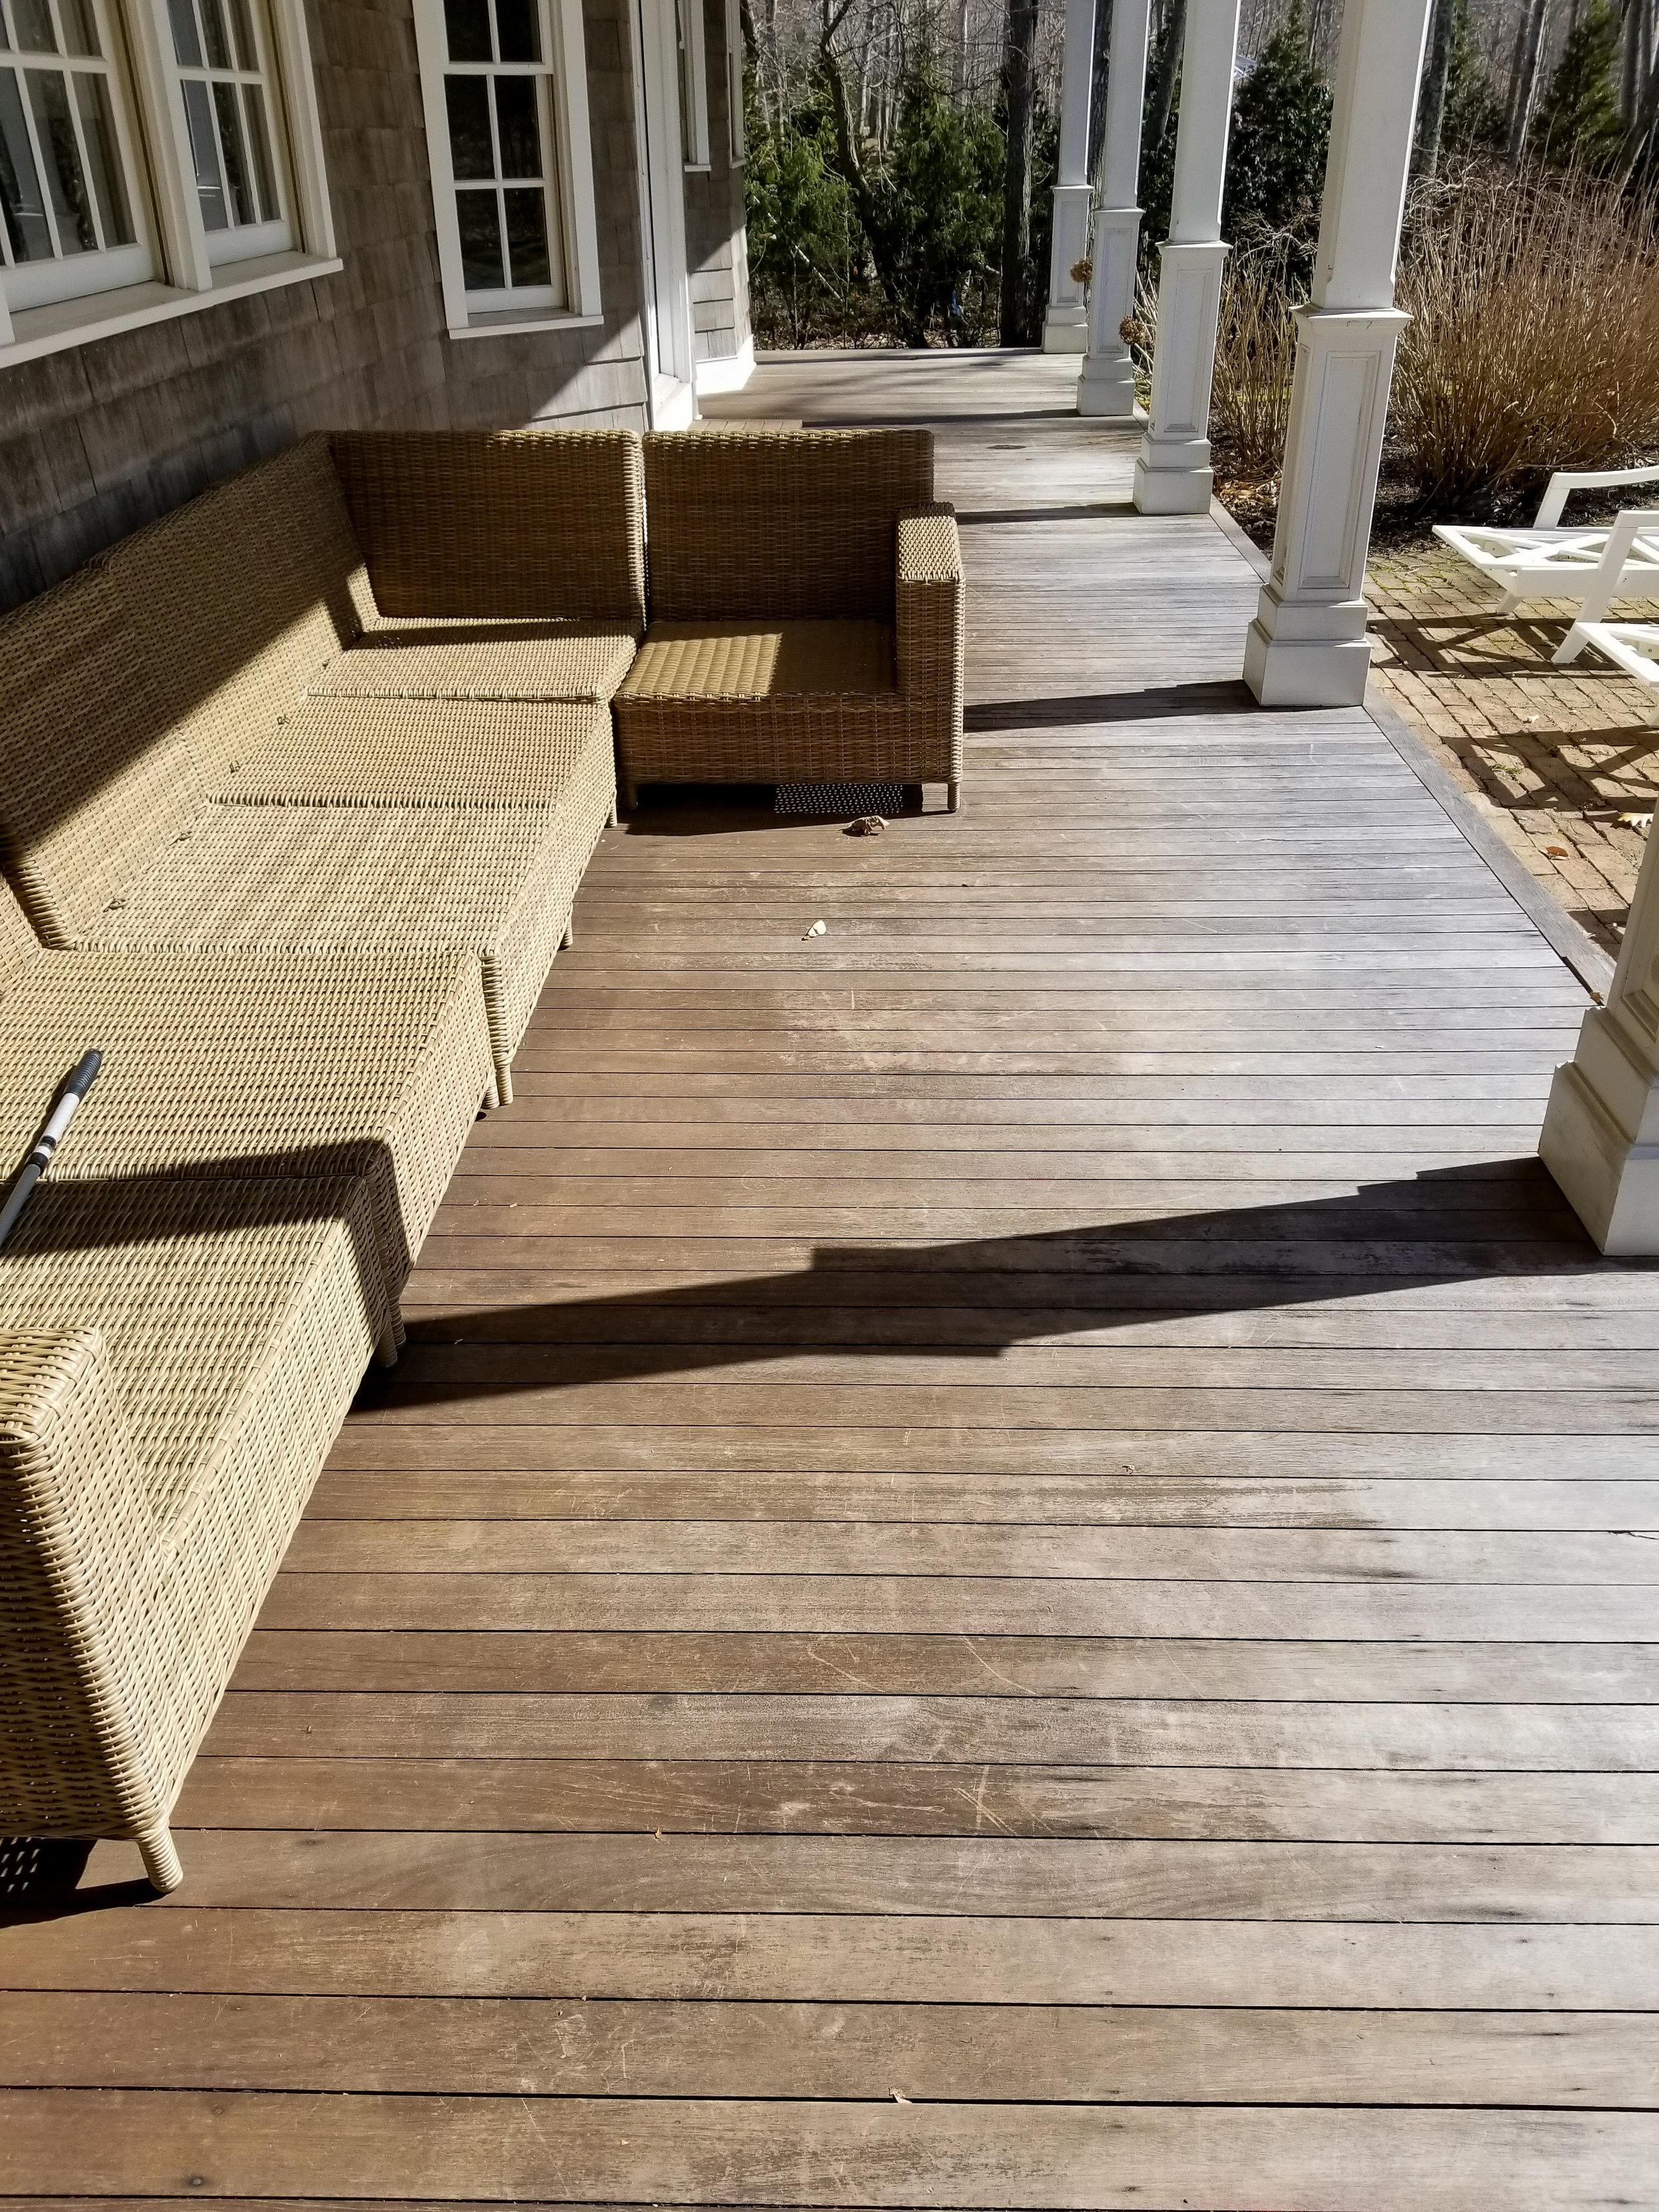 Mahogany Deck Resurface & PVC Column Install Before